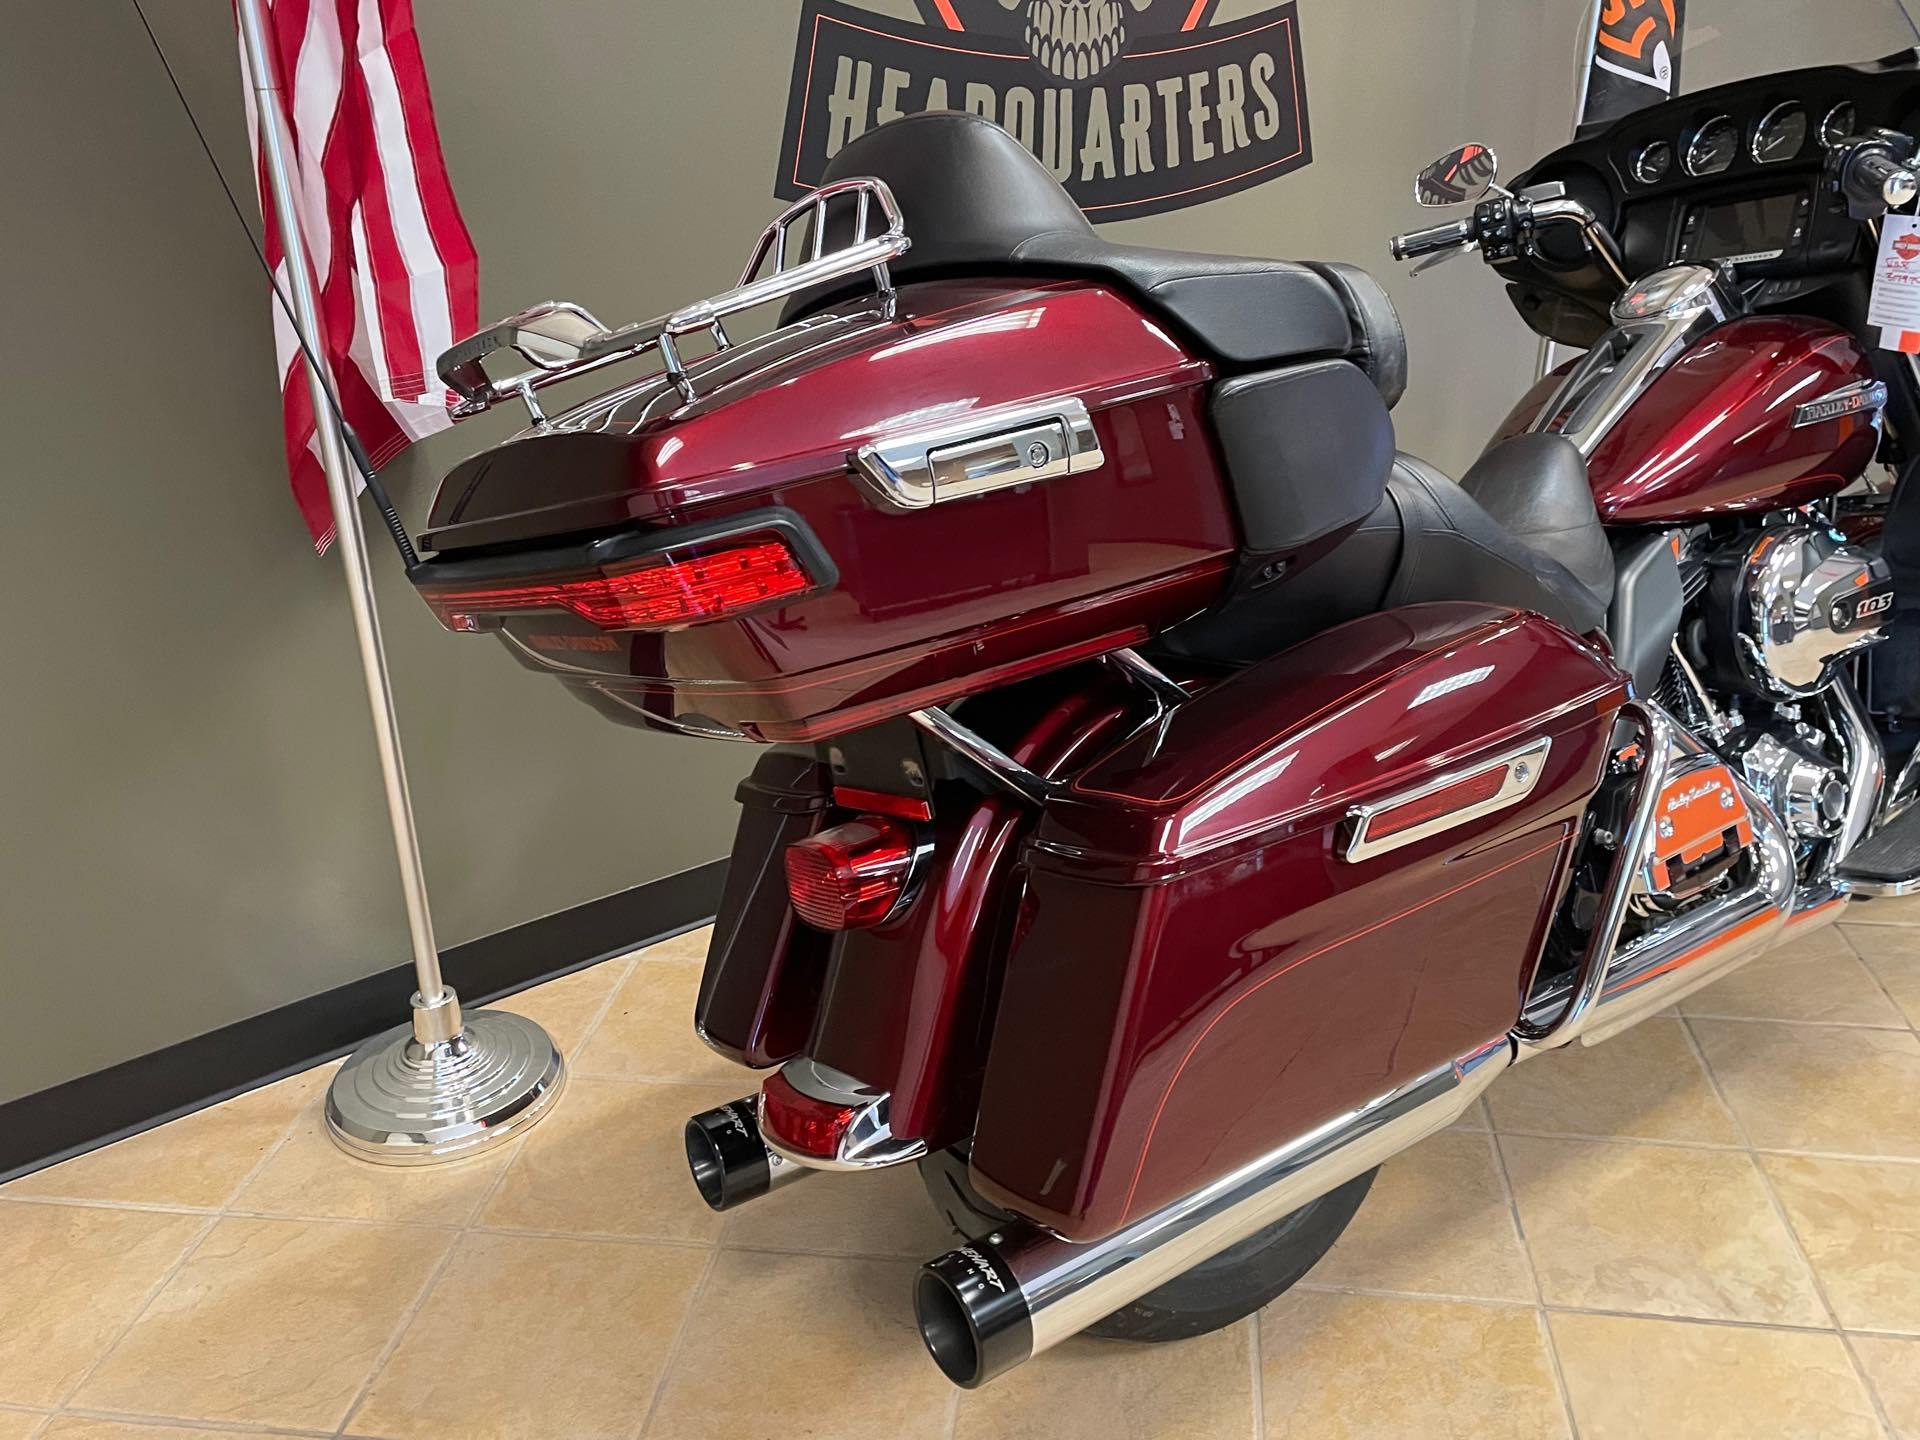 2015 Harley-Davidson Electra Glide Ultra Classic at Loess Hills Harley-Davidson